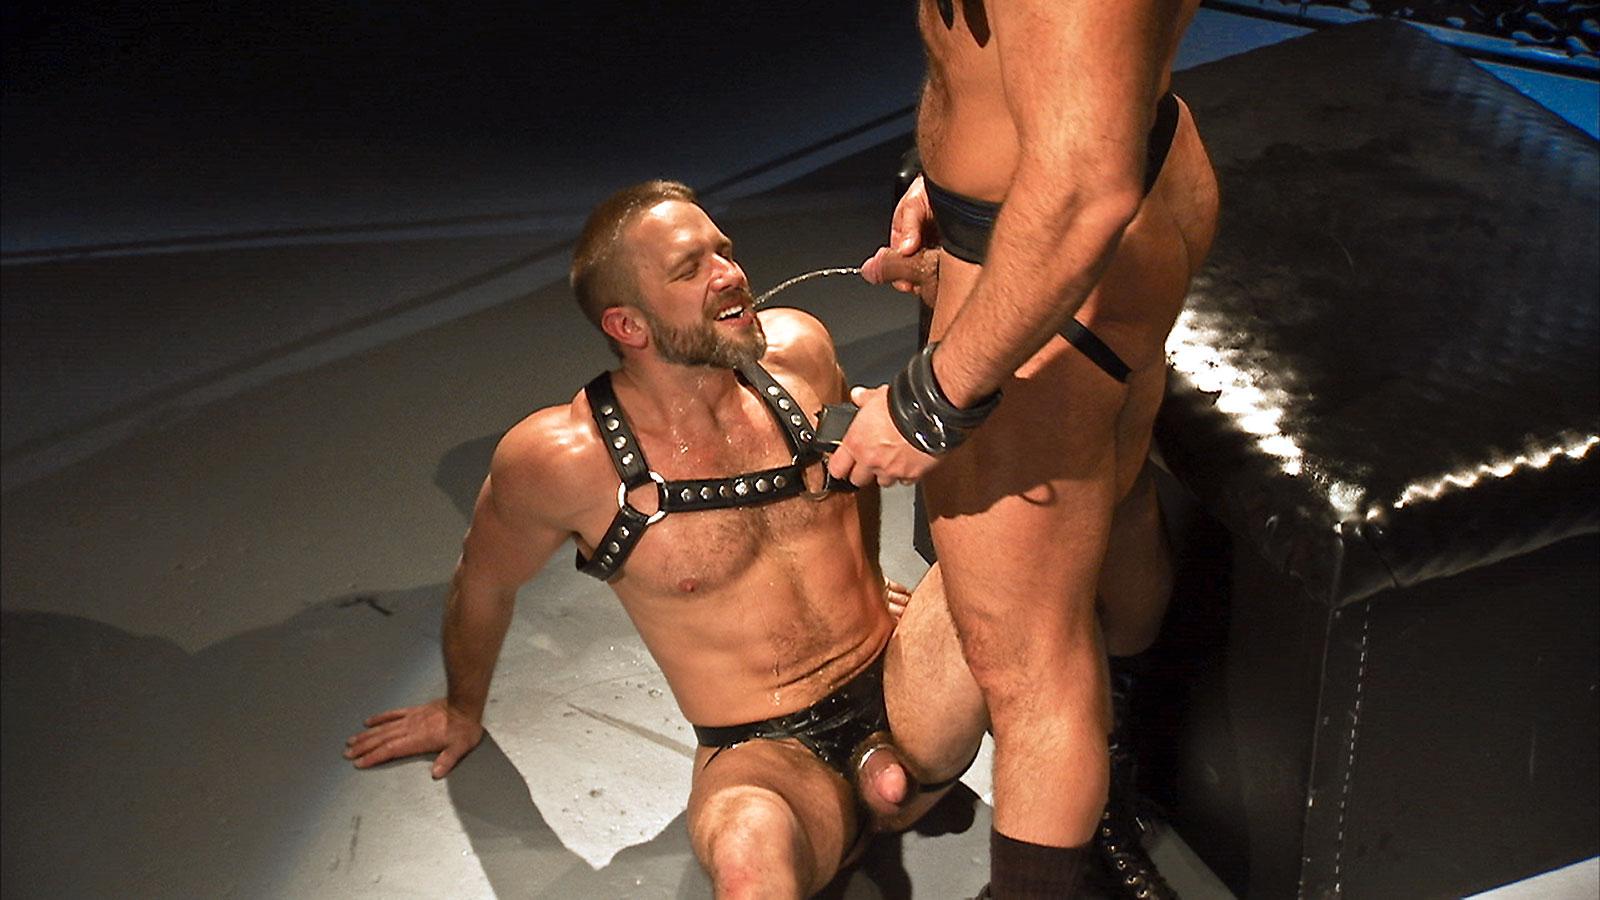 Gay bondage titan men porn